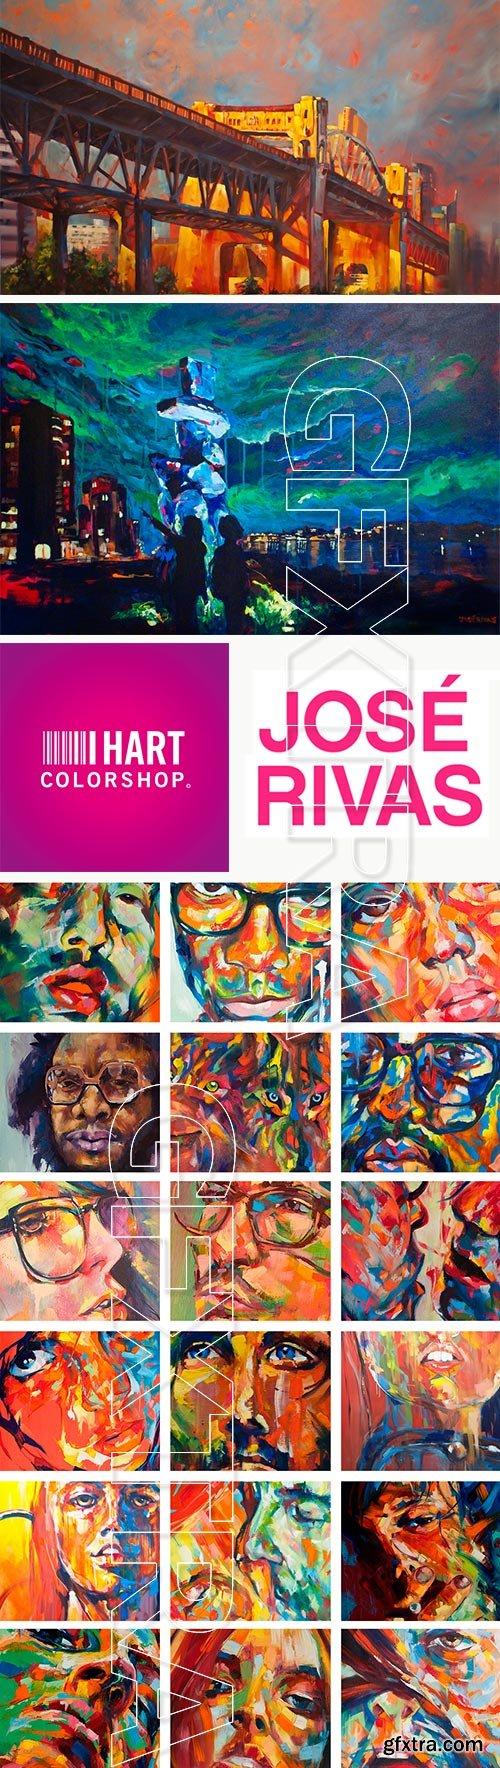 Jose Rivas, Spanish Paint Artist - I Hart Color Paintings